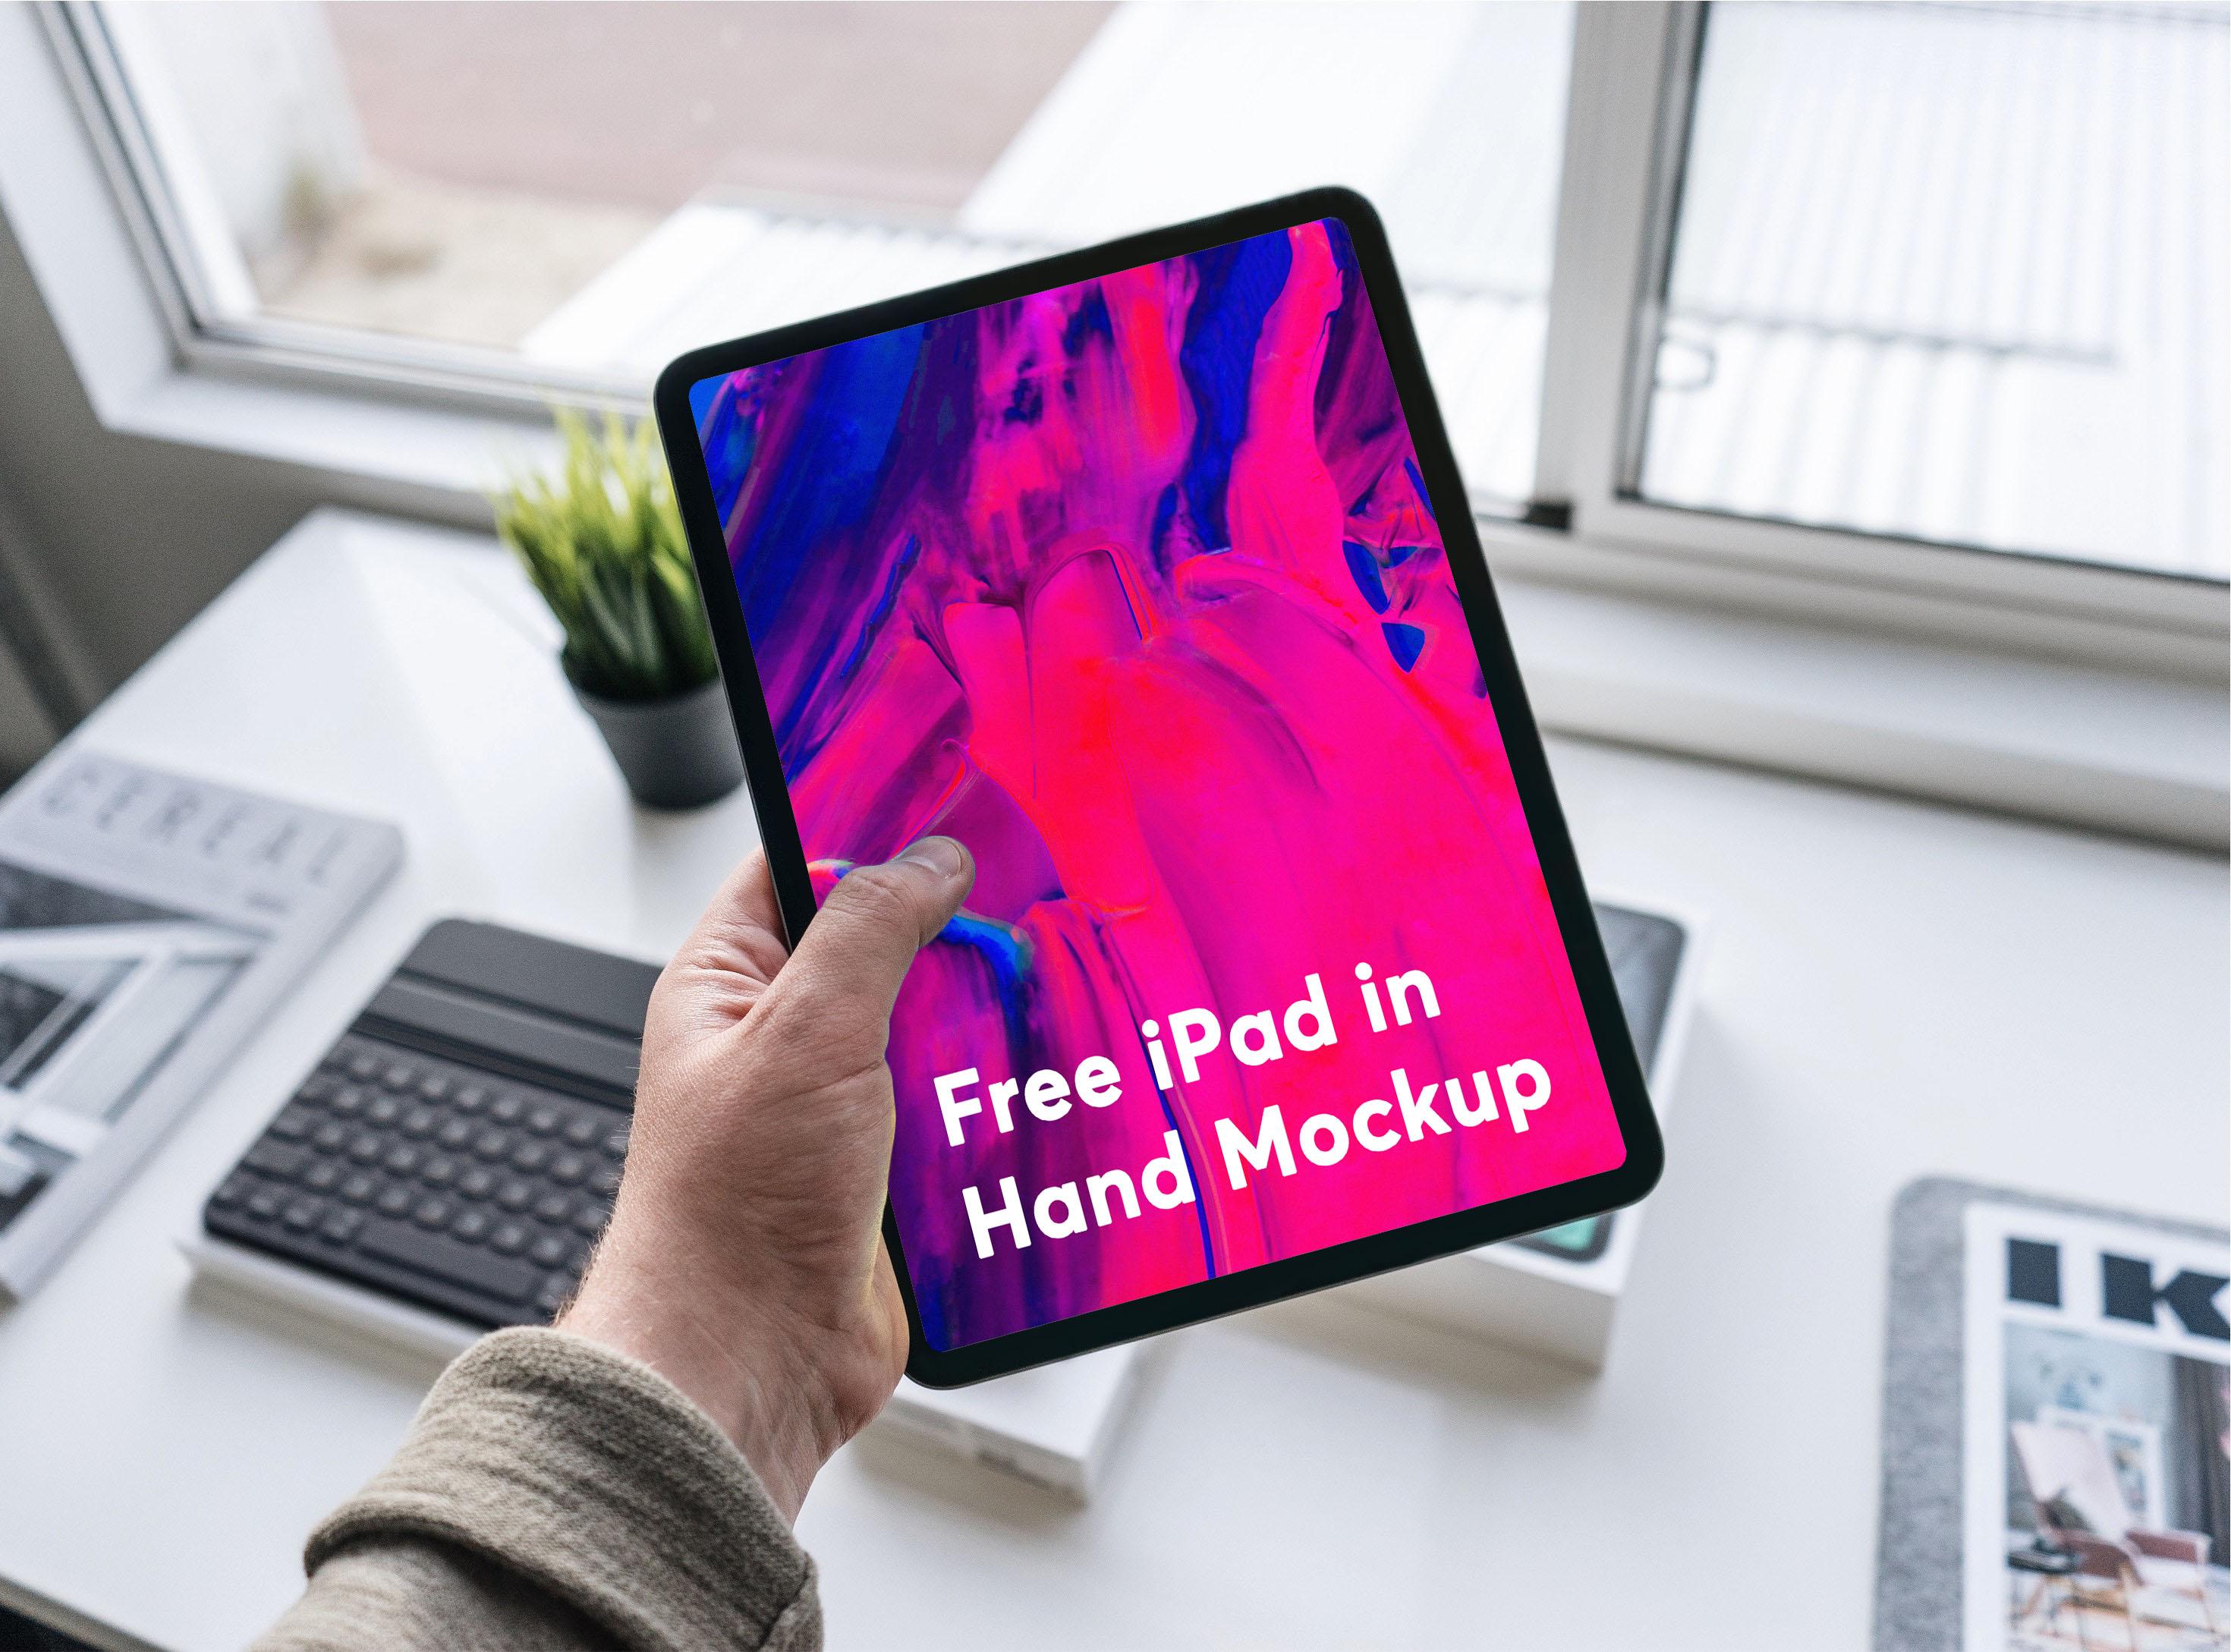 Free ipad in hand mockup